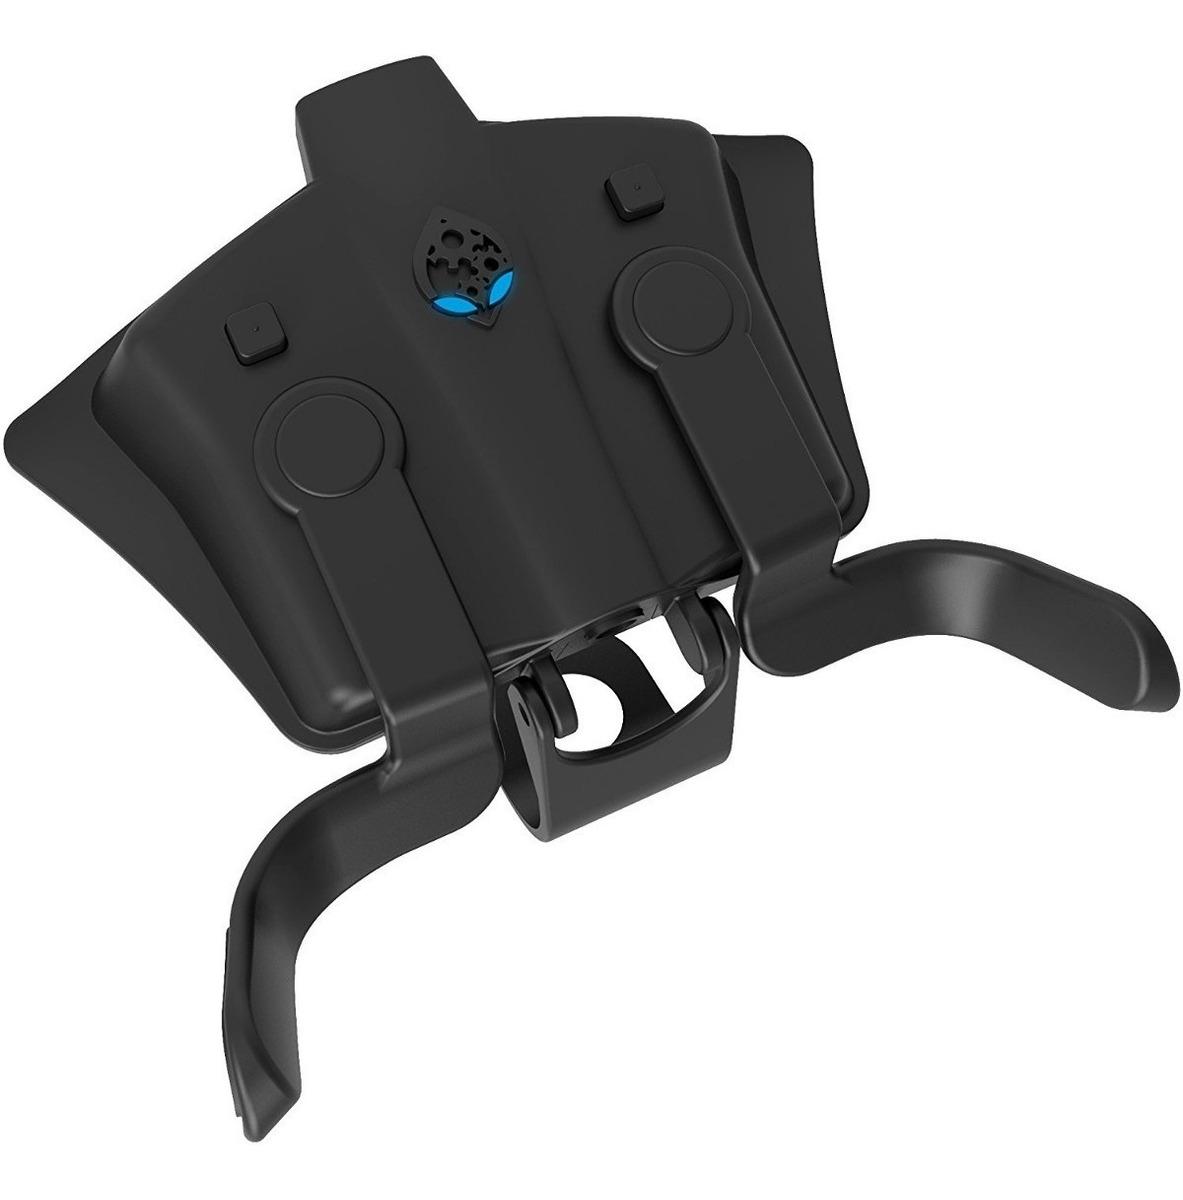 Strikepack Dominator Adaptador Ps4 Anti Recoil Rapid Fire